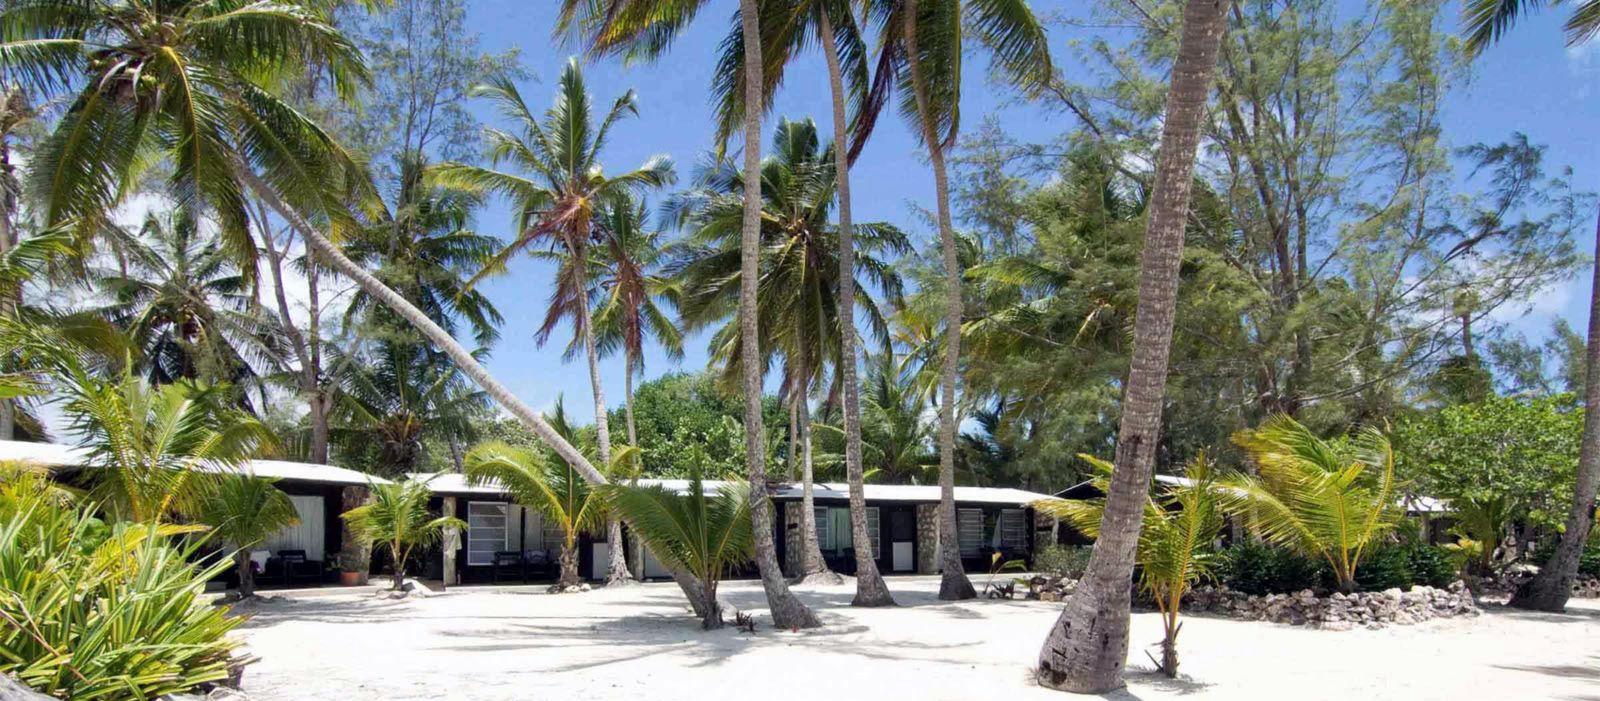 Impression Small Hope Bay Lodges